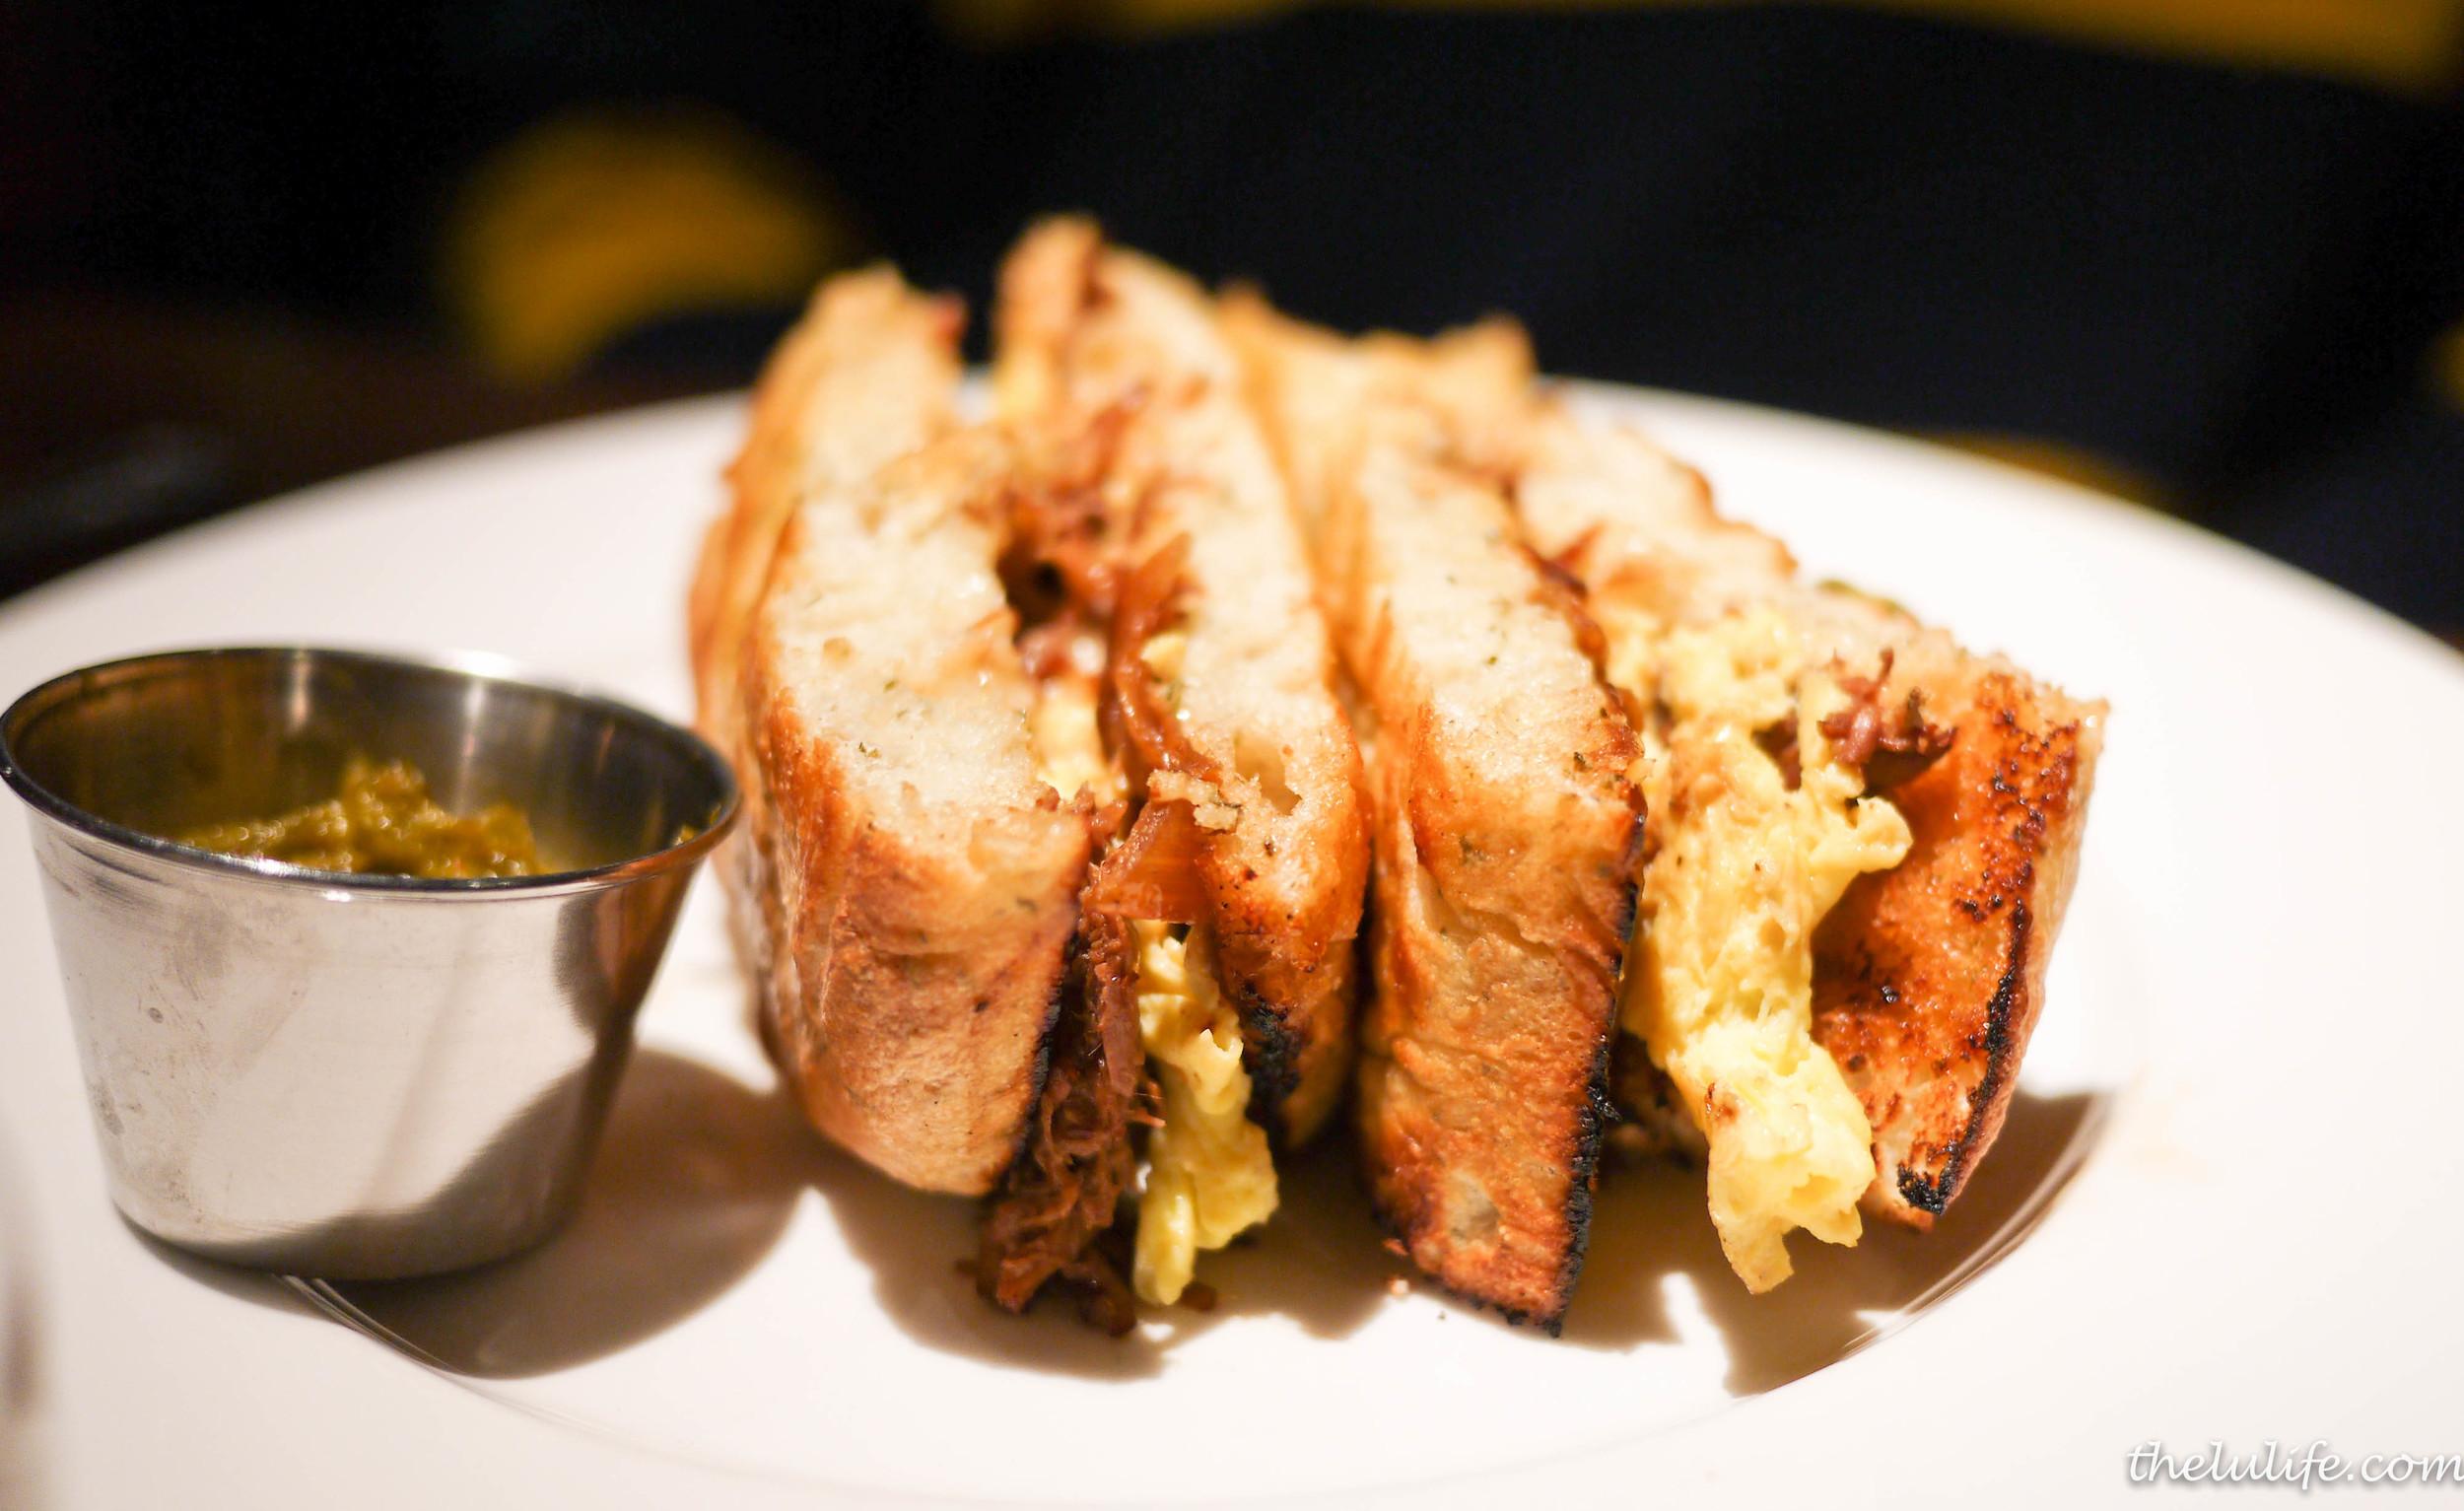 Braised pot roast and egg sandwich - aged white cheddar, jalapeno relish